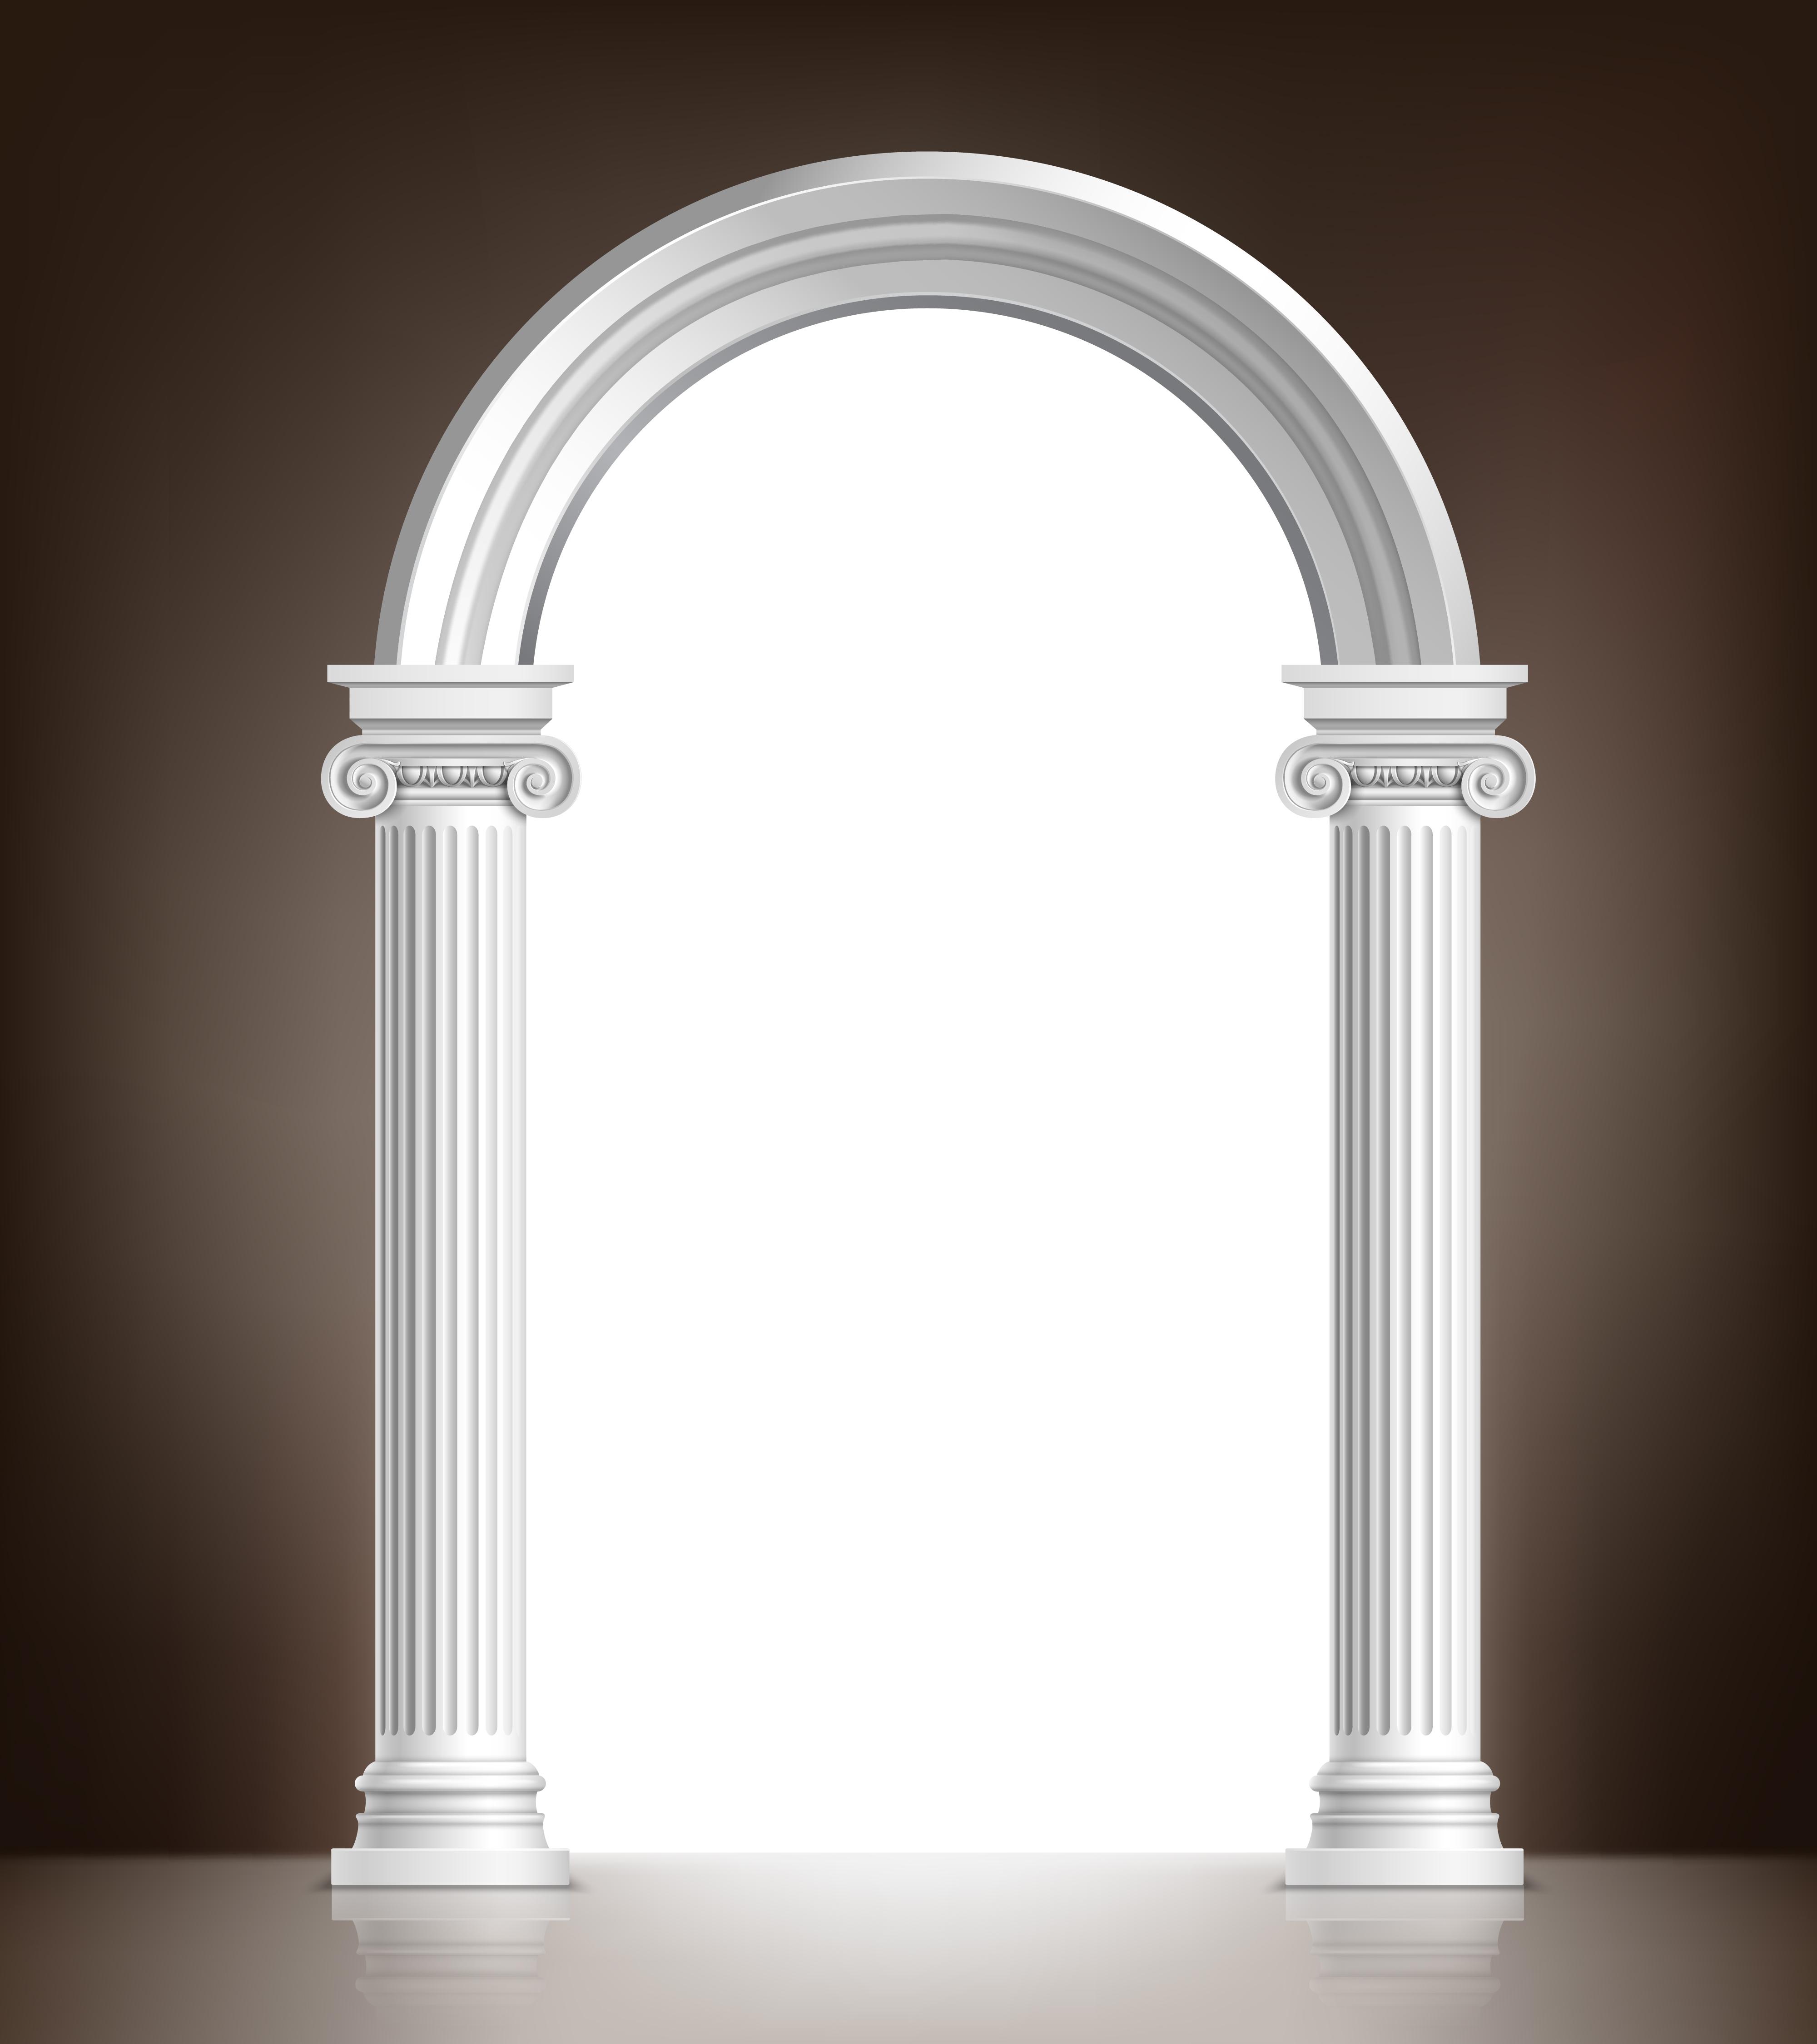 Realistic White Arch Download Free Vectors Clipart